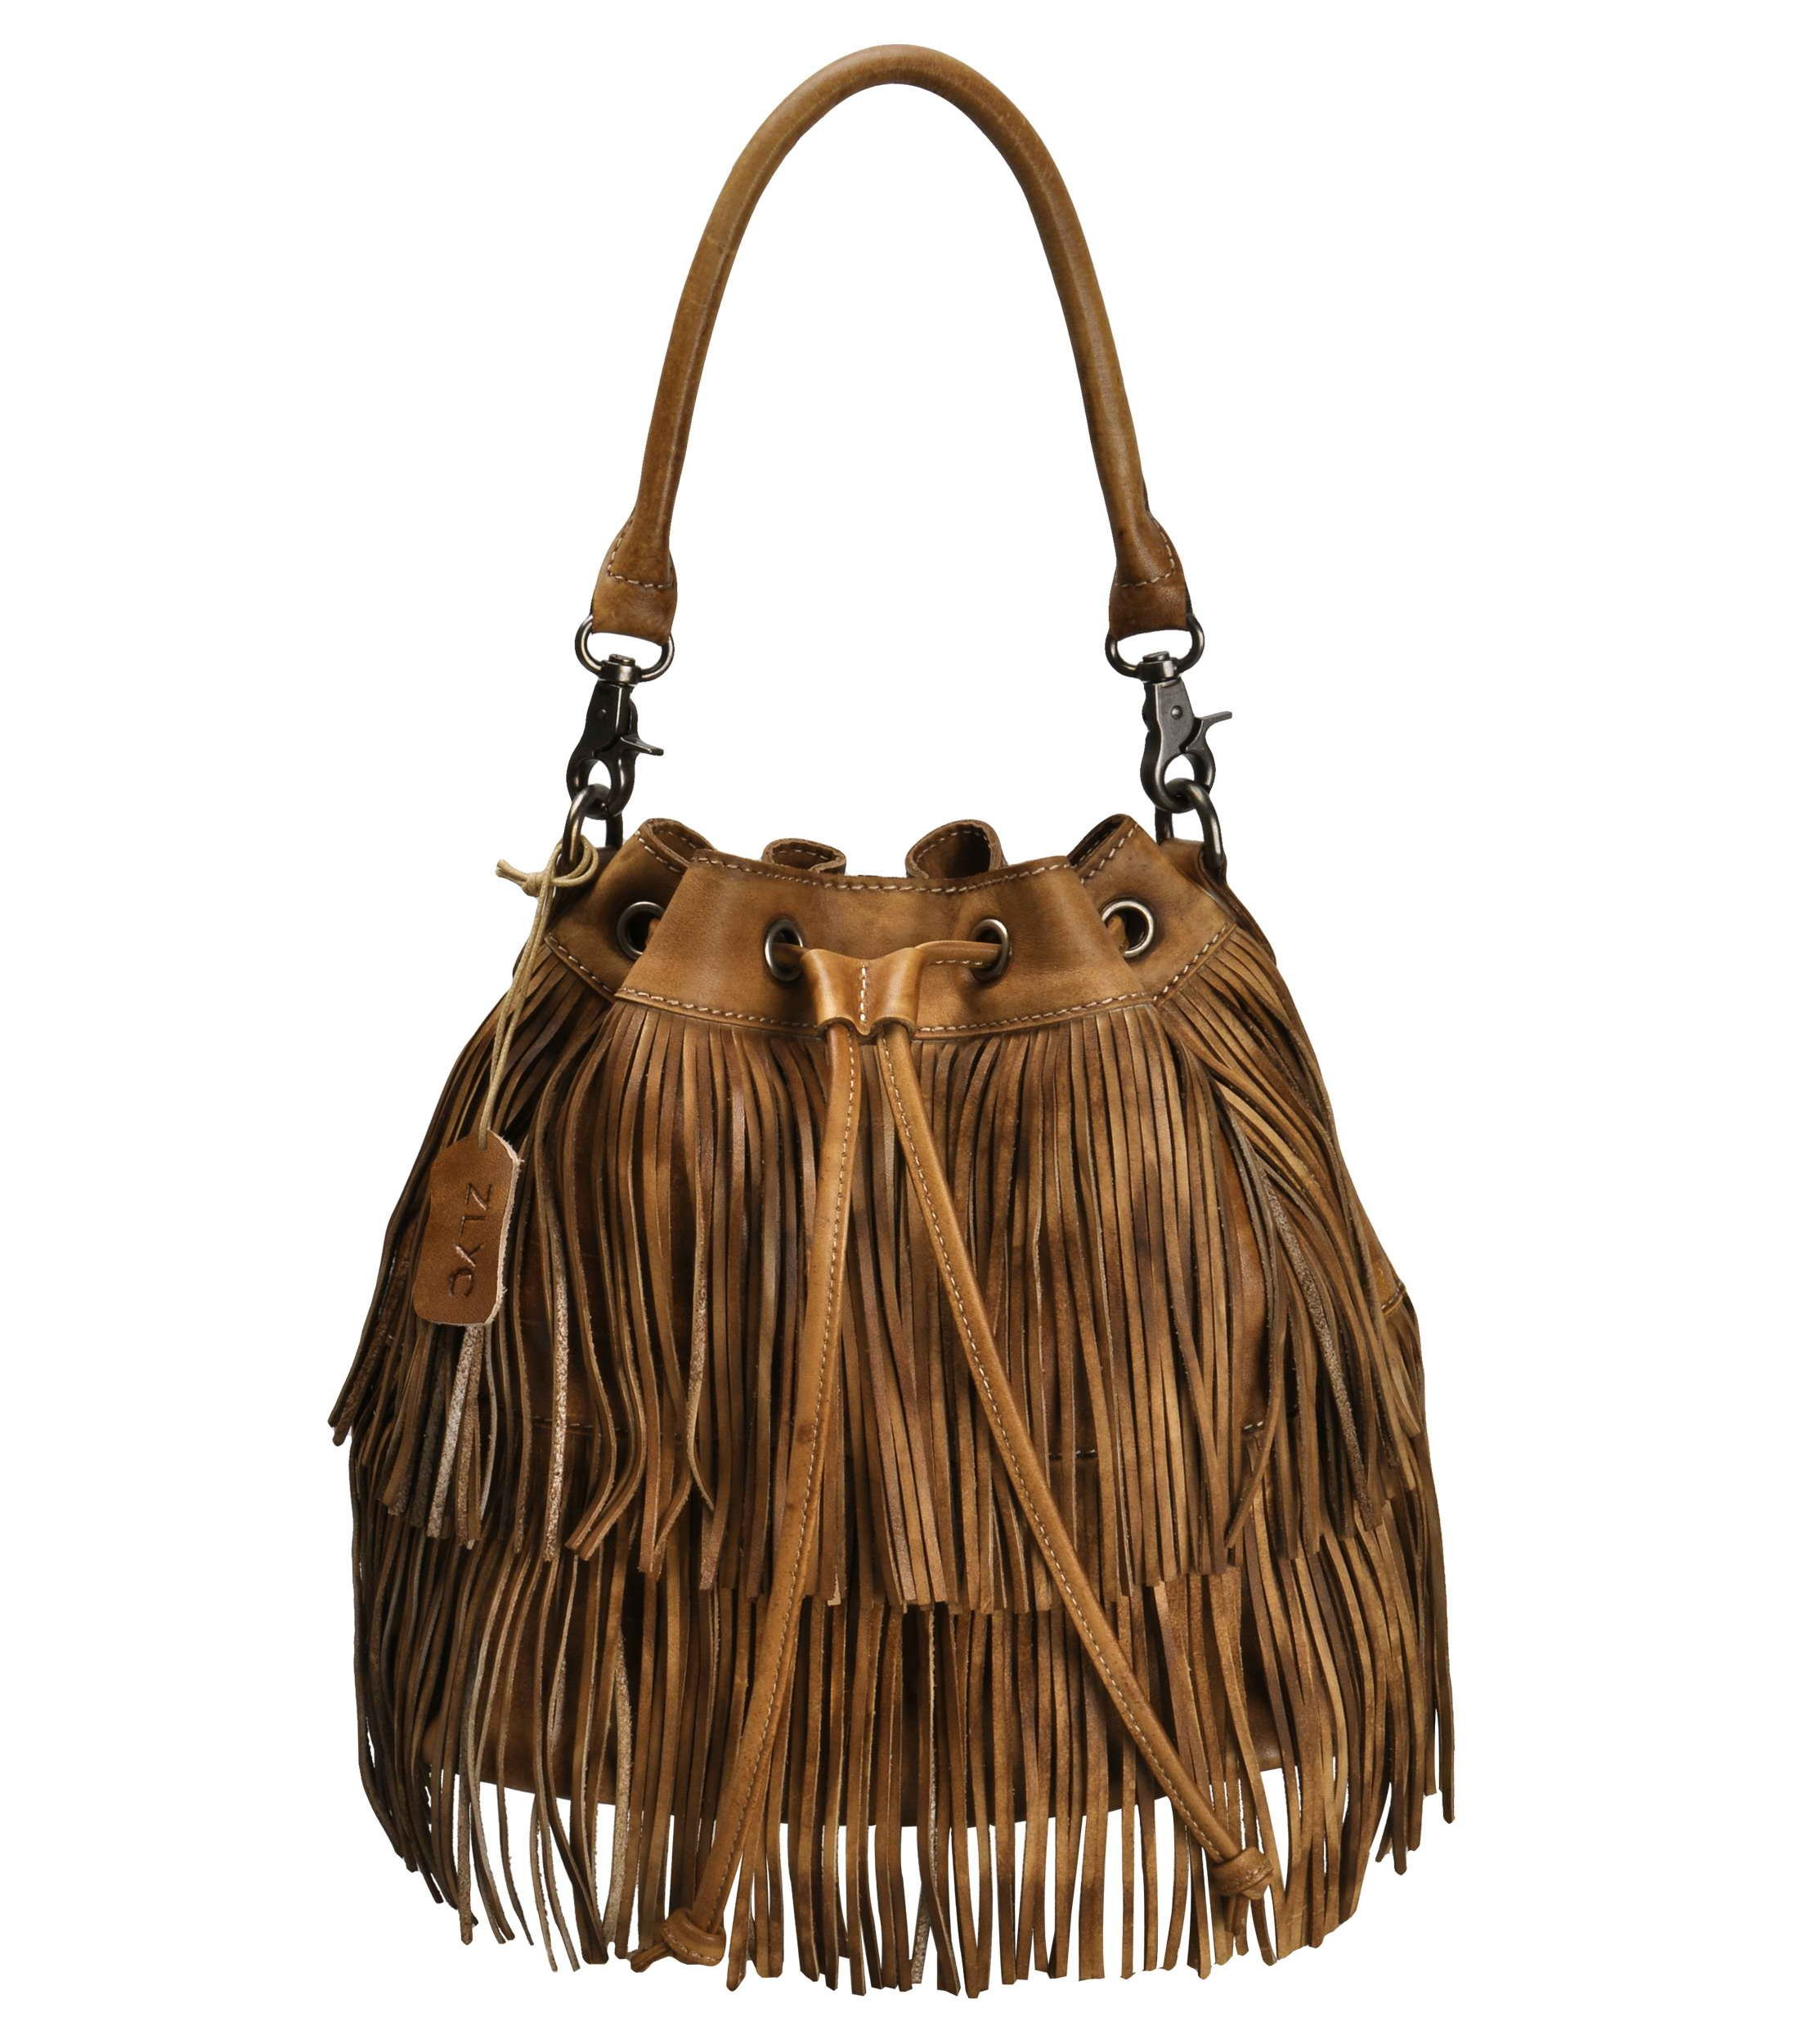 ZLYC Women Handmade Dip Dye Leather Bohemian Fringe Tassel Drawstring Bucket Bag, Brown